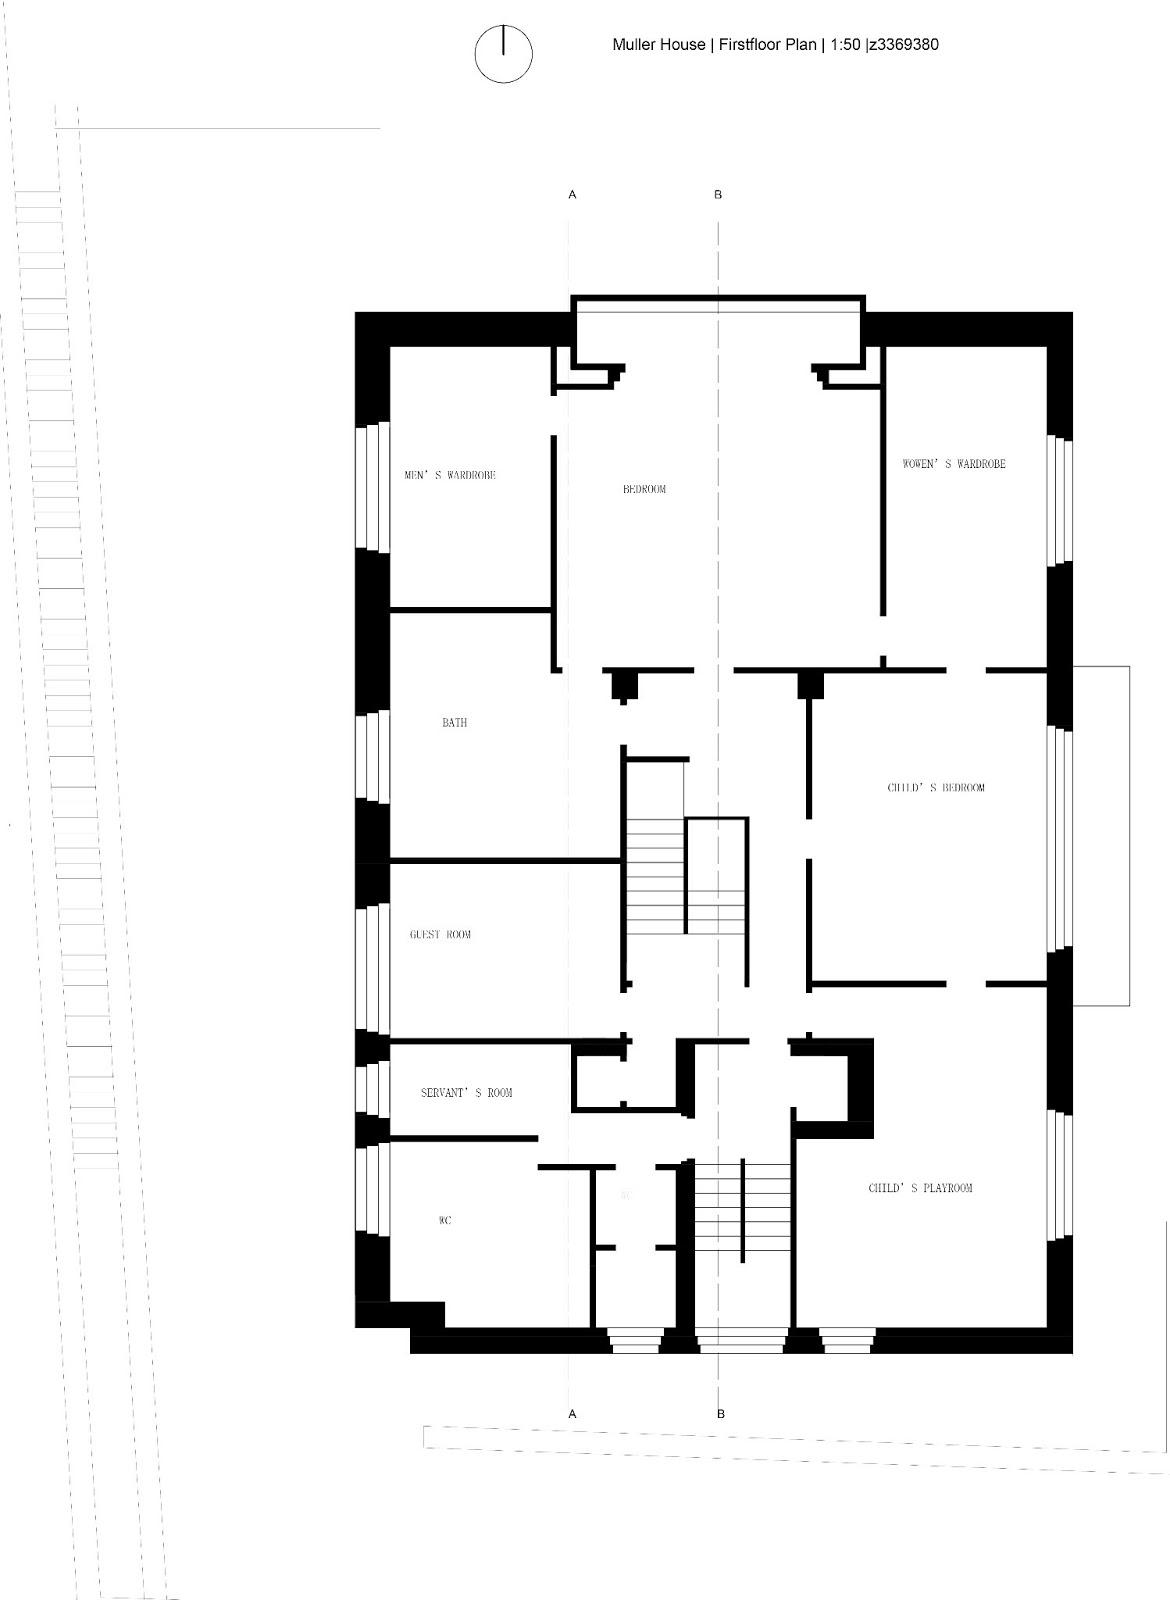 Villa Elevation Plan : Tianlu jiang arch part a villa muller plans sections